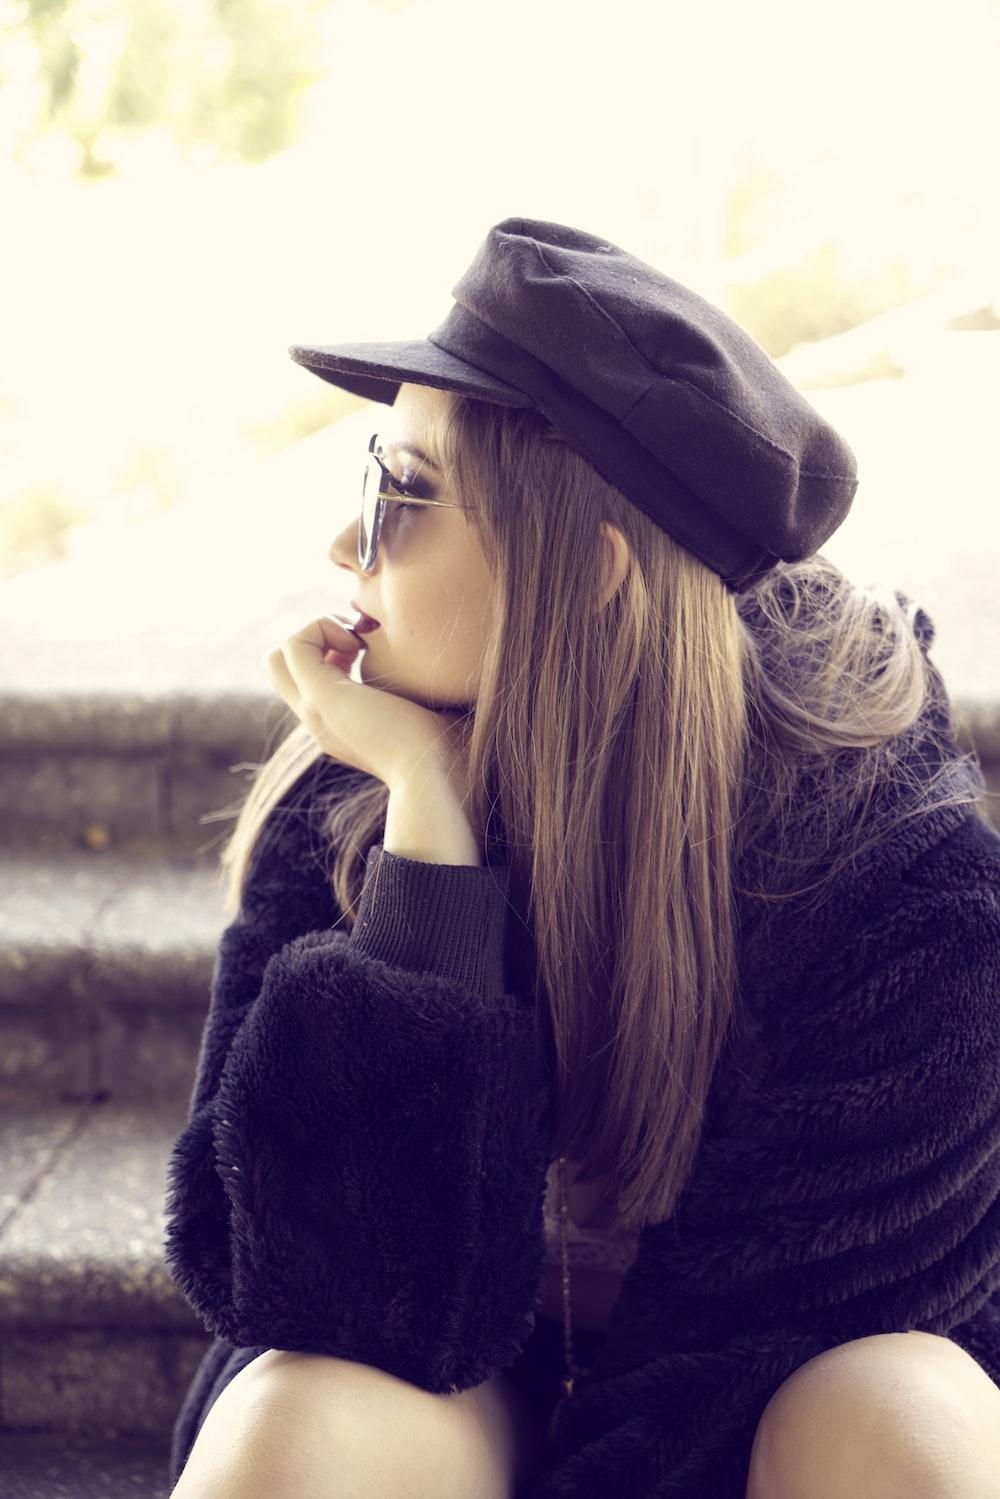 woman wearing black sweater looking side view